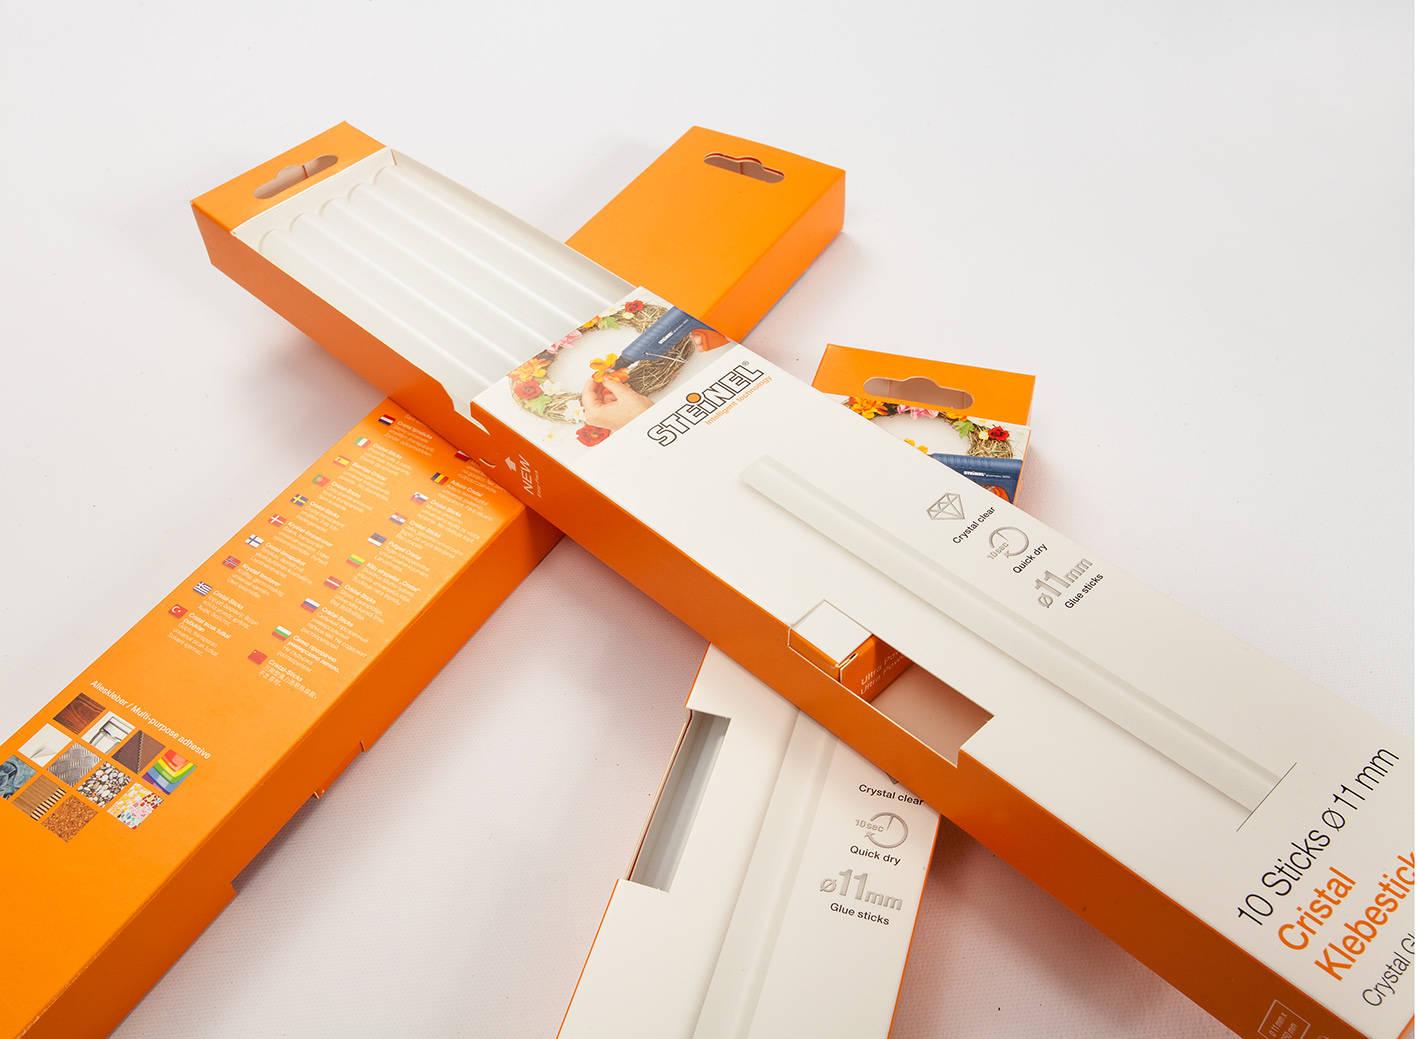 carton-award-image 17018